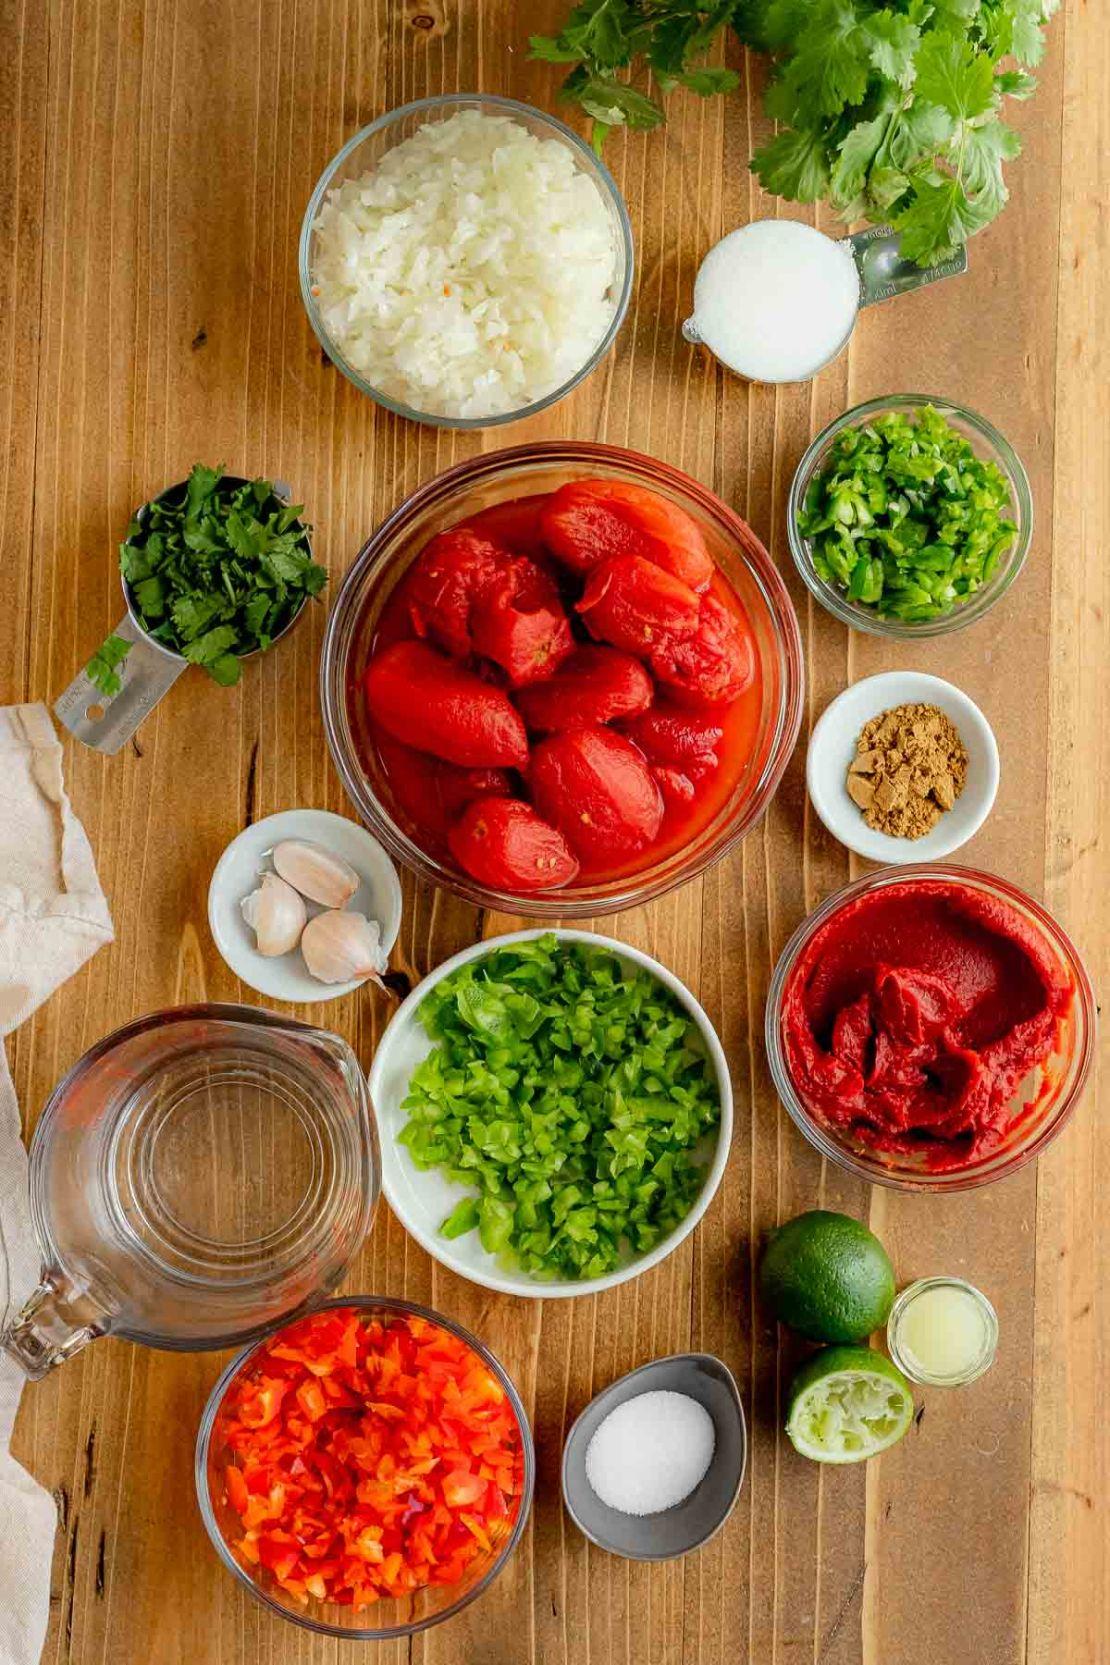 Ingredients for Easy Cooked Jar Salsa in prep bowls